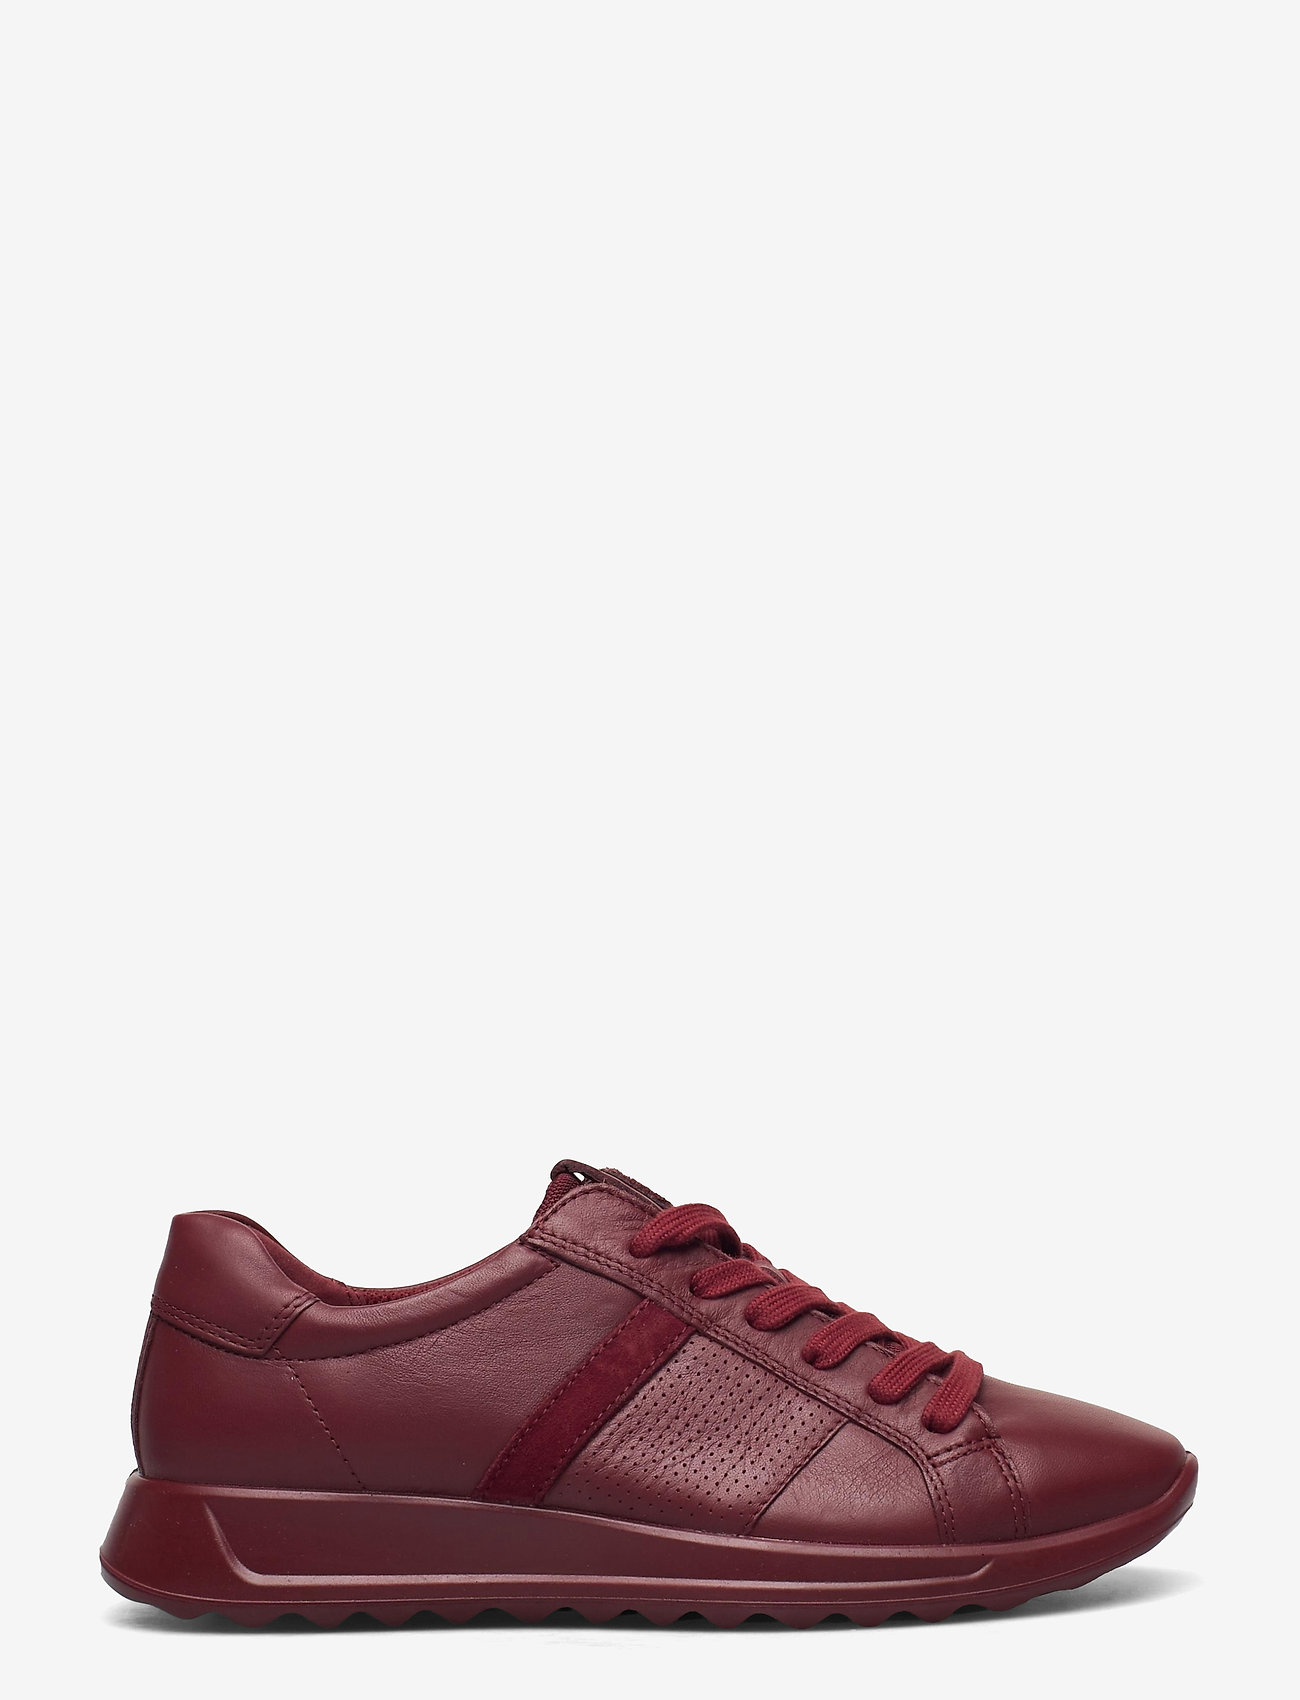 ECCO - FLEXURE RUNNER W - lage sneakers - syrah/syrah - 1